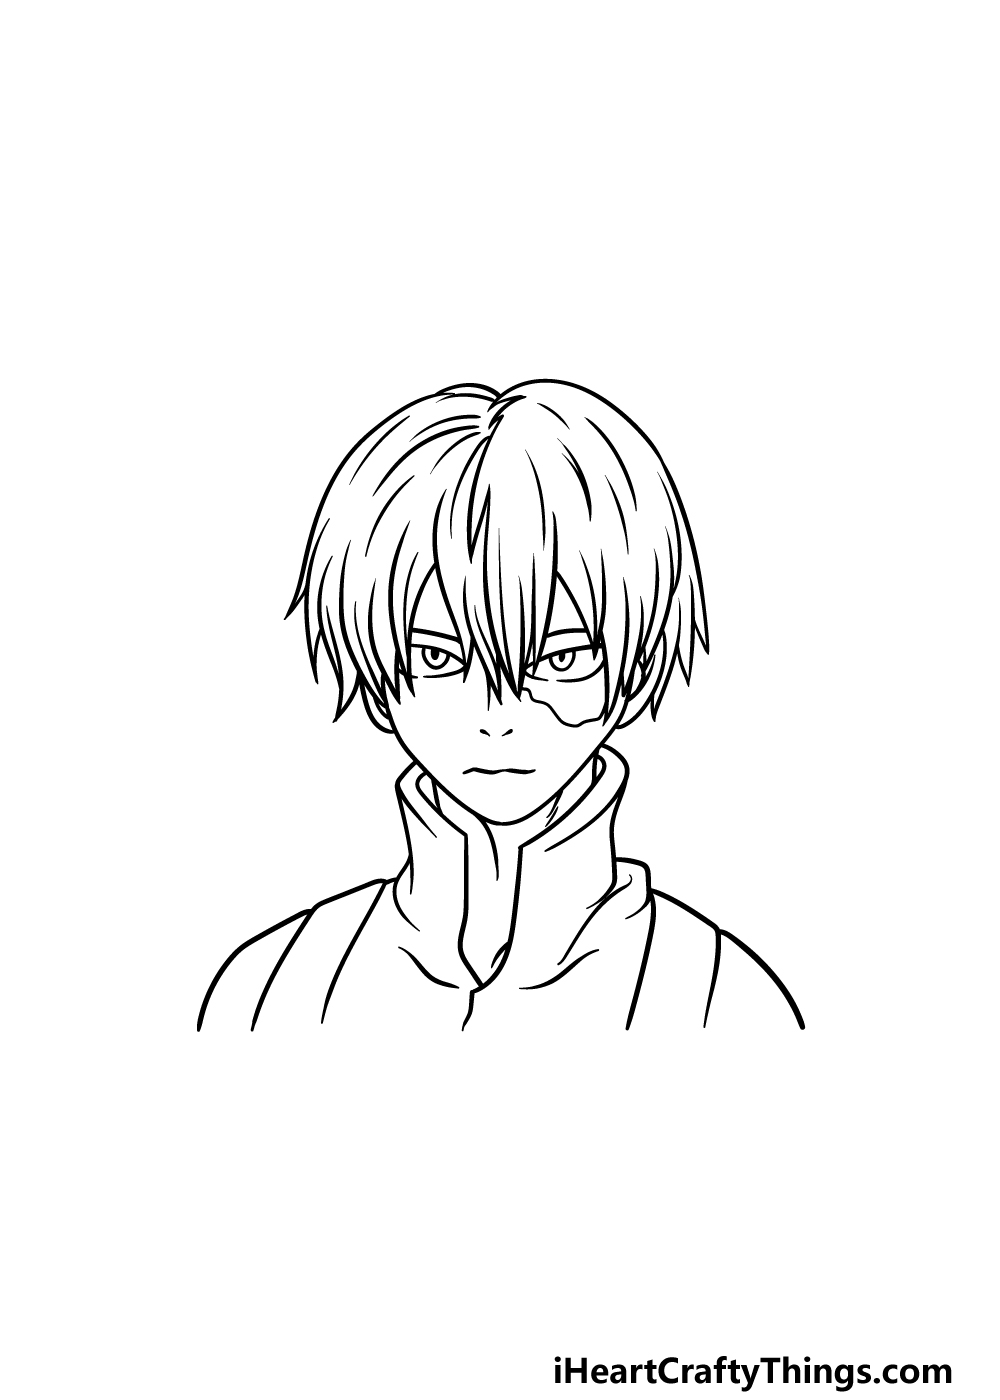 How To Draw Todoroki step 5